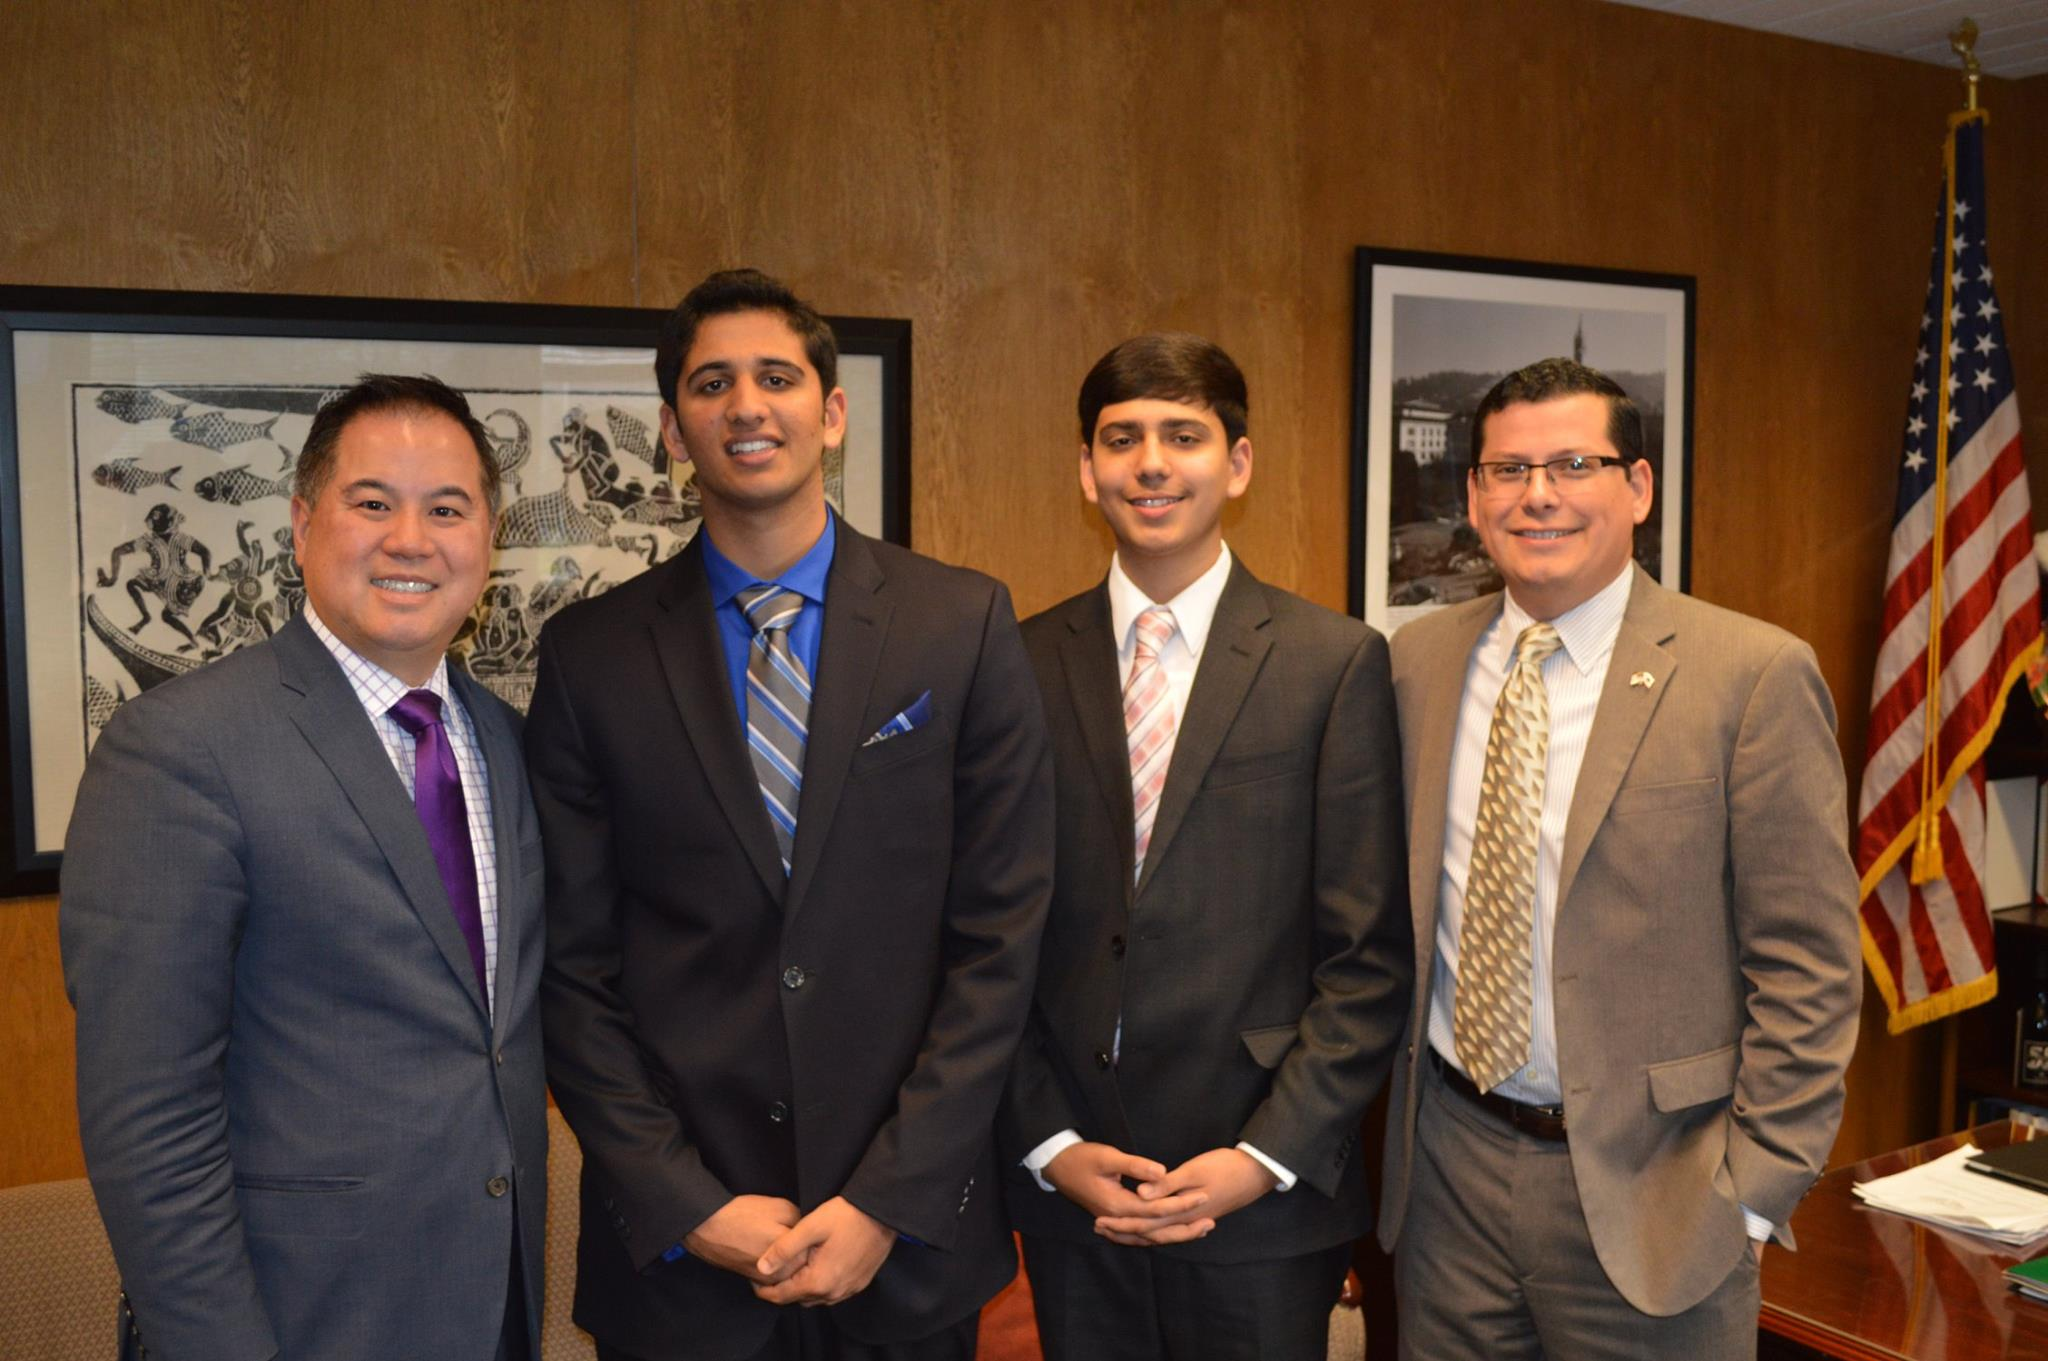 Brothers Arijeet and Rajvarun Grewal, students in Hanford, CA